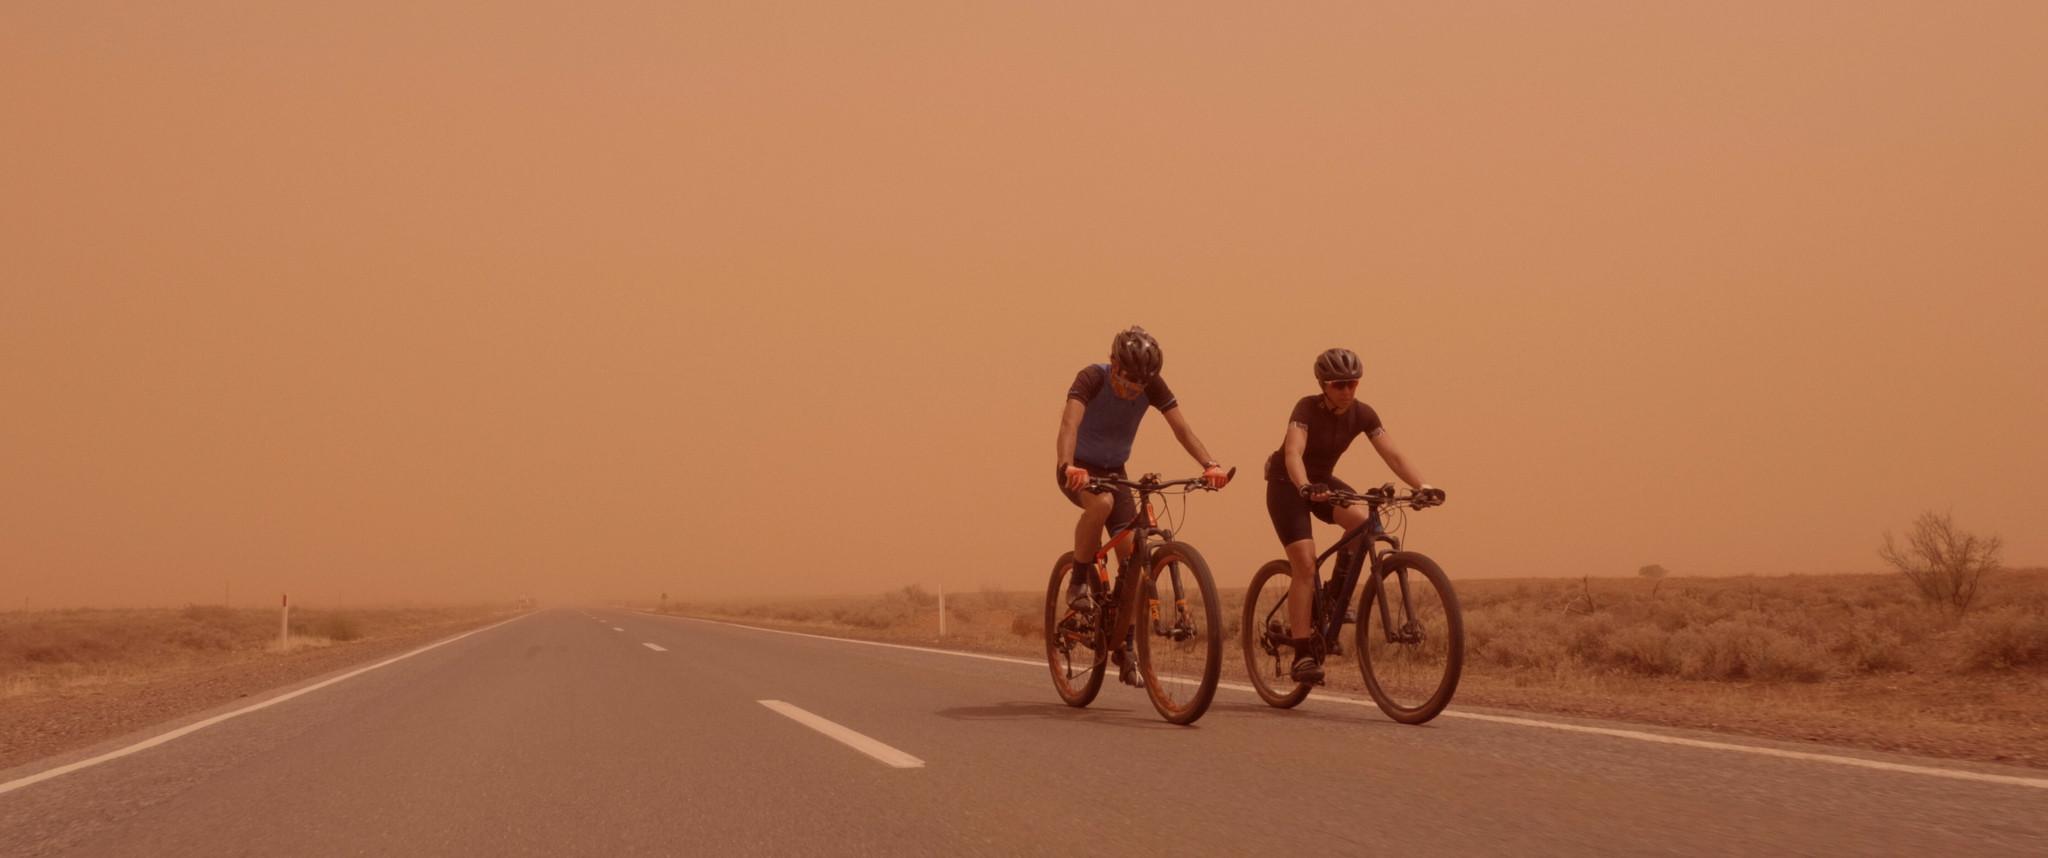 Riding through the Dust storm .jpg